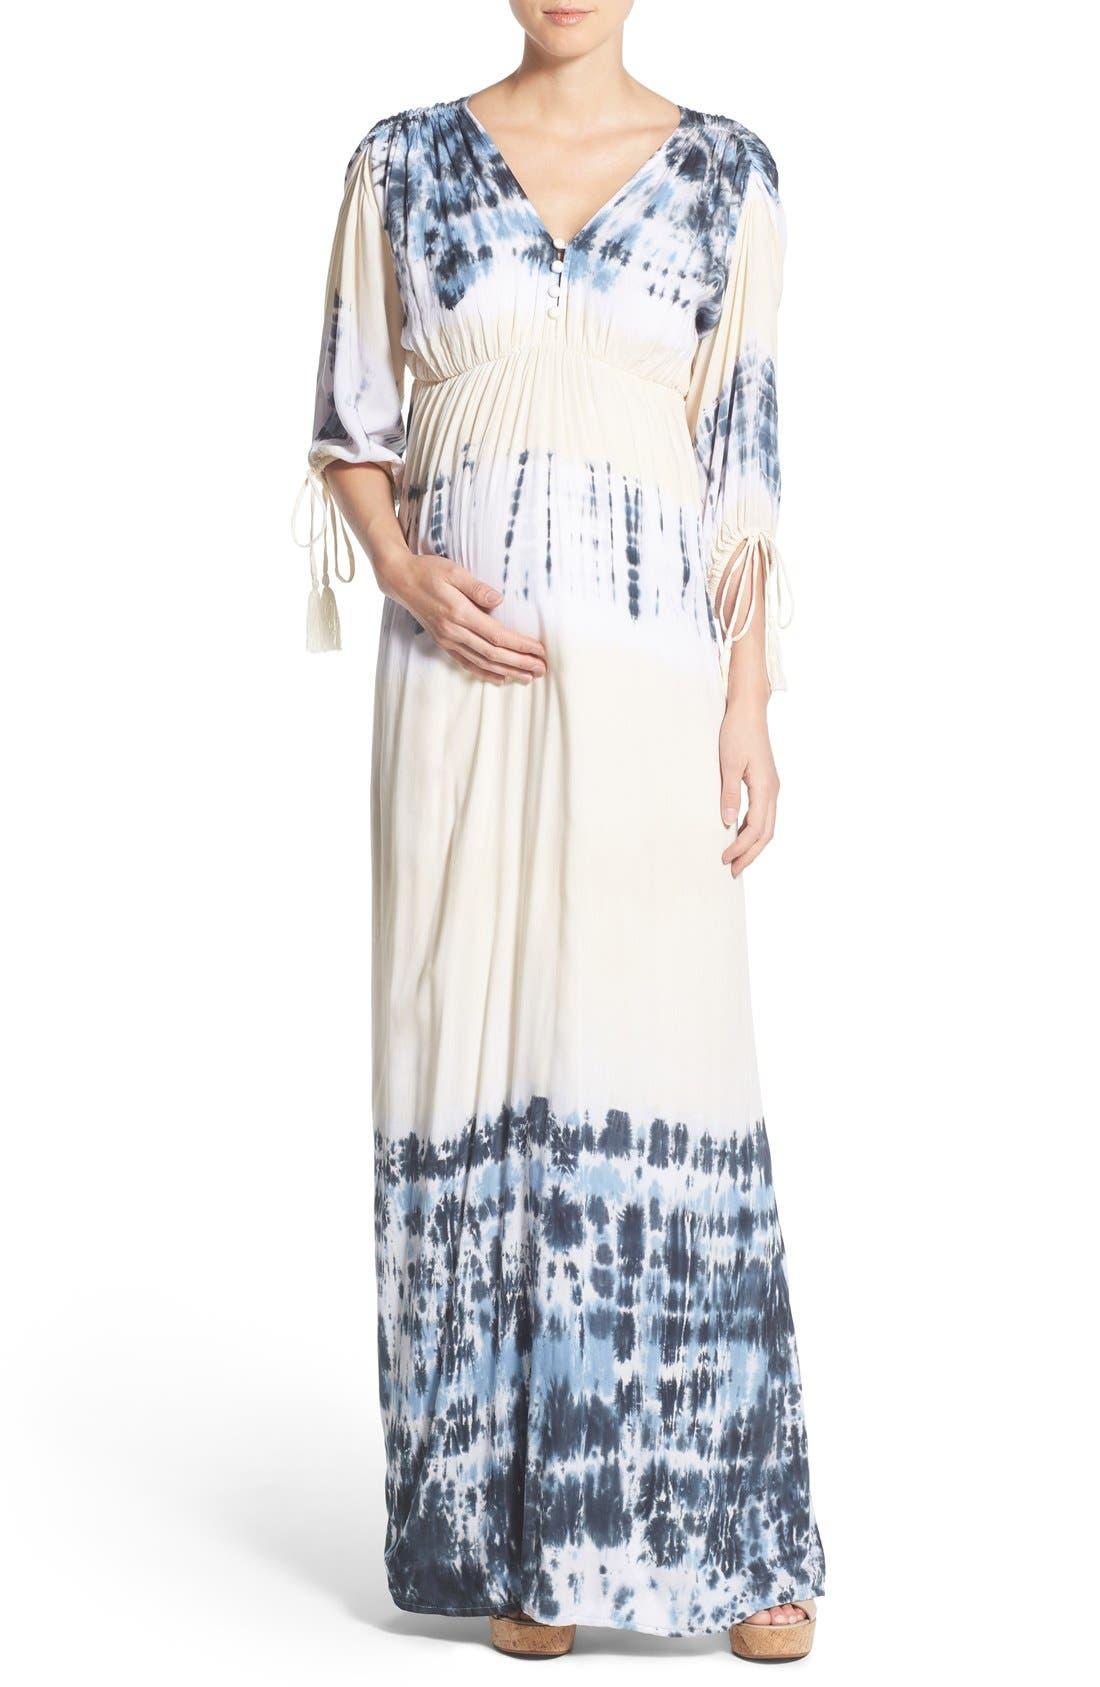 Fillyboo 'Banjo' Tie Dye Maternity Maxi Dress